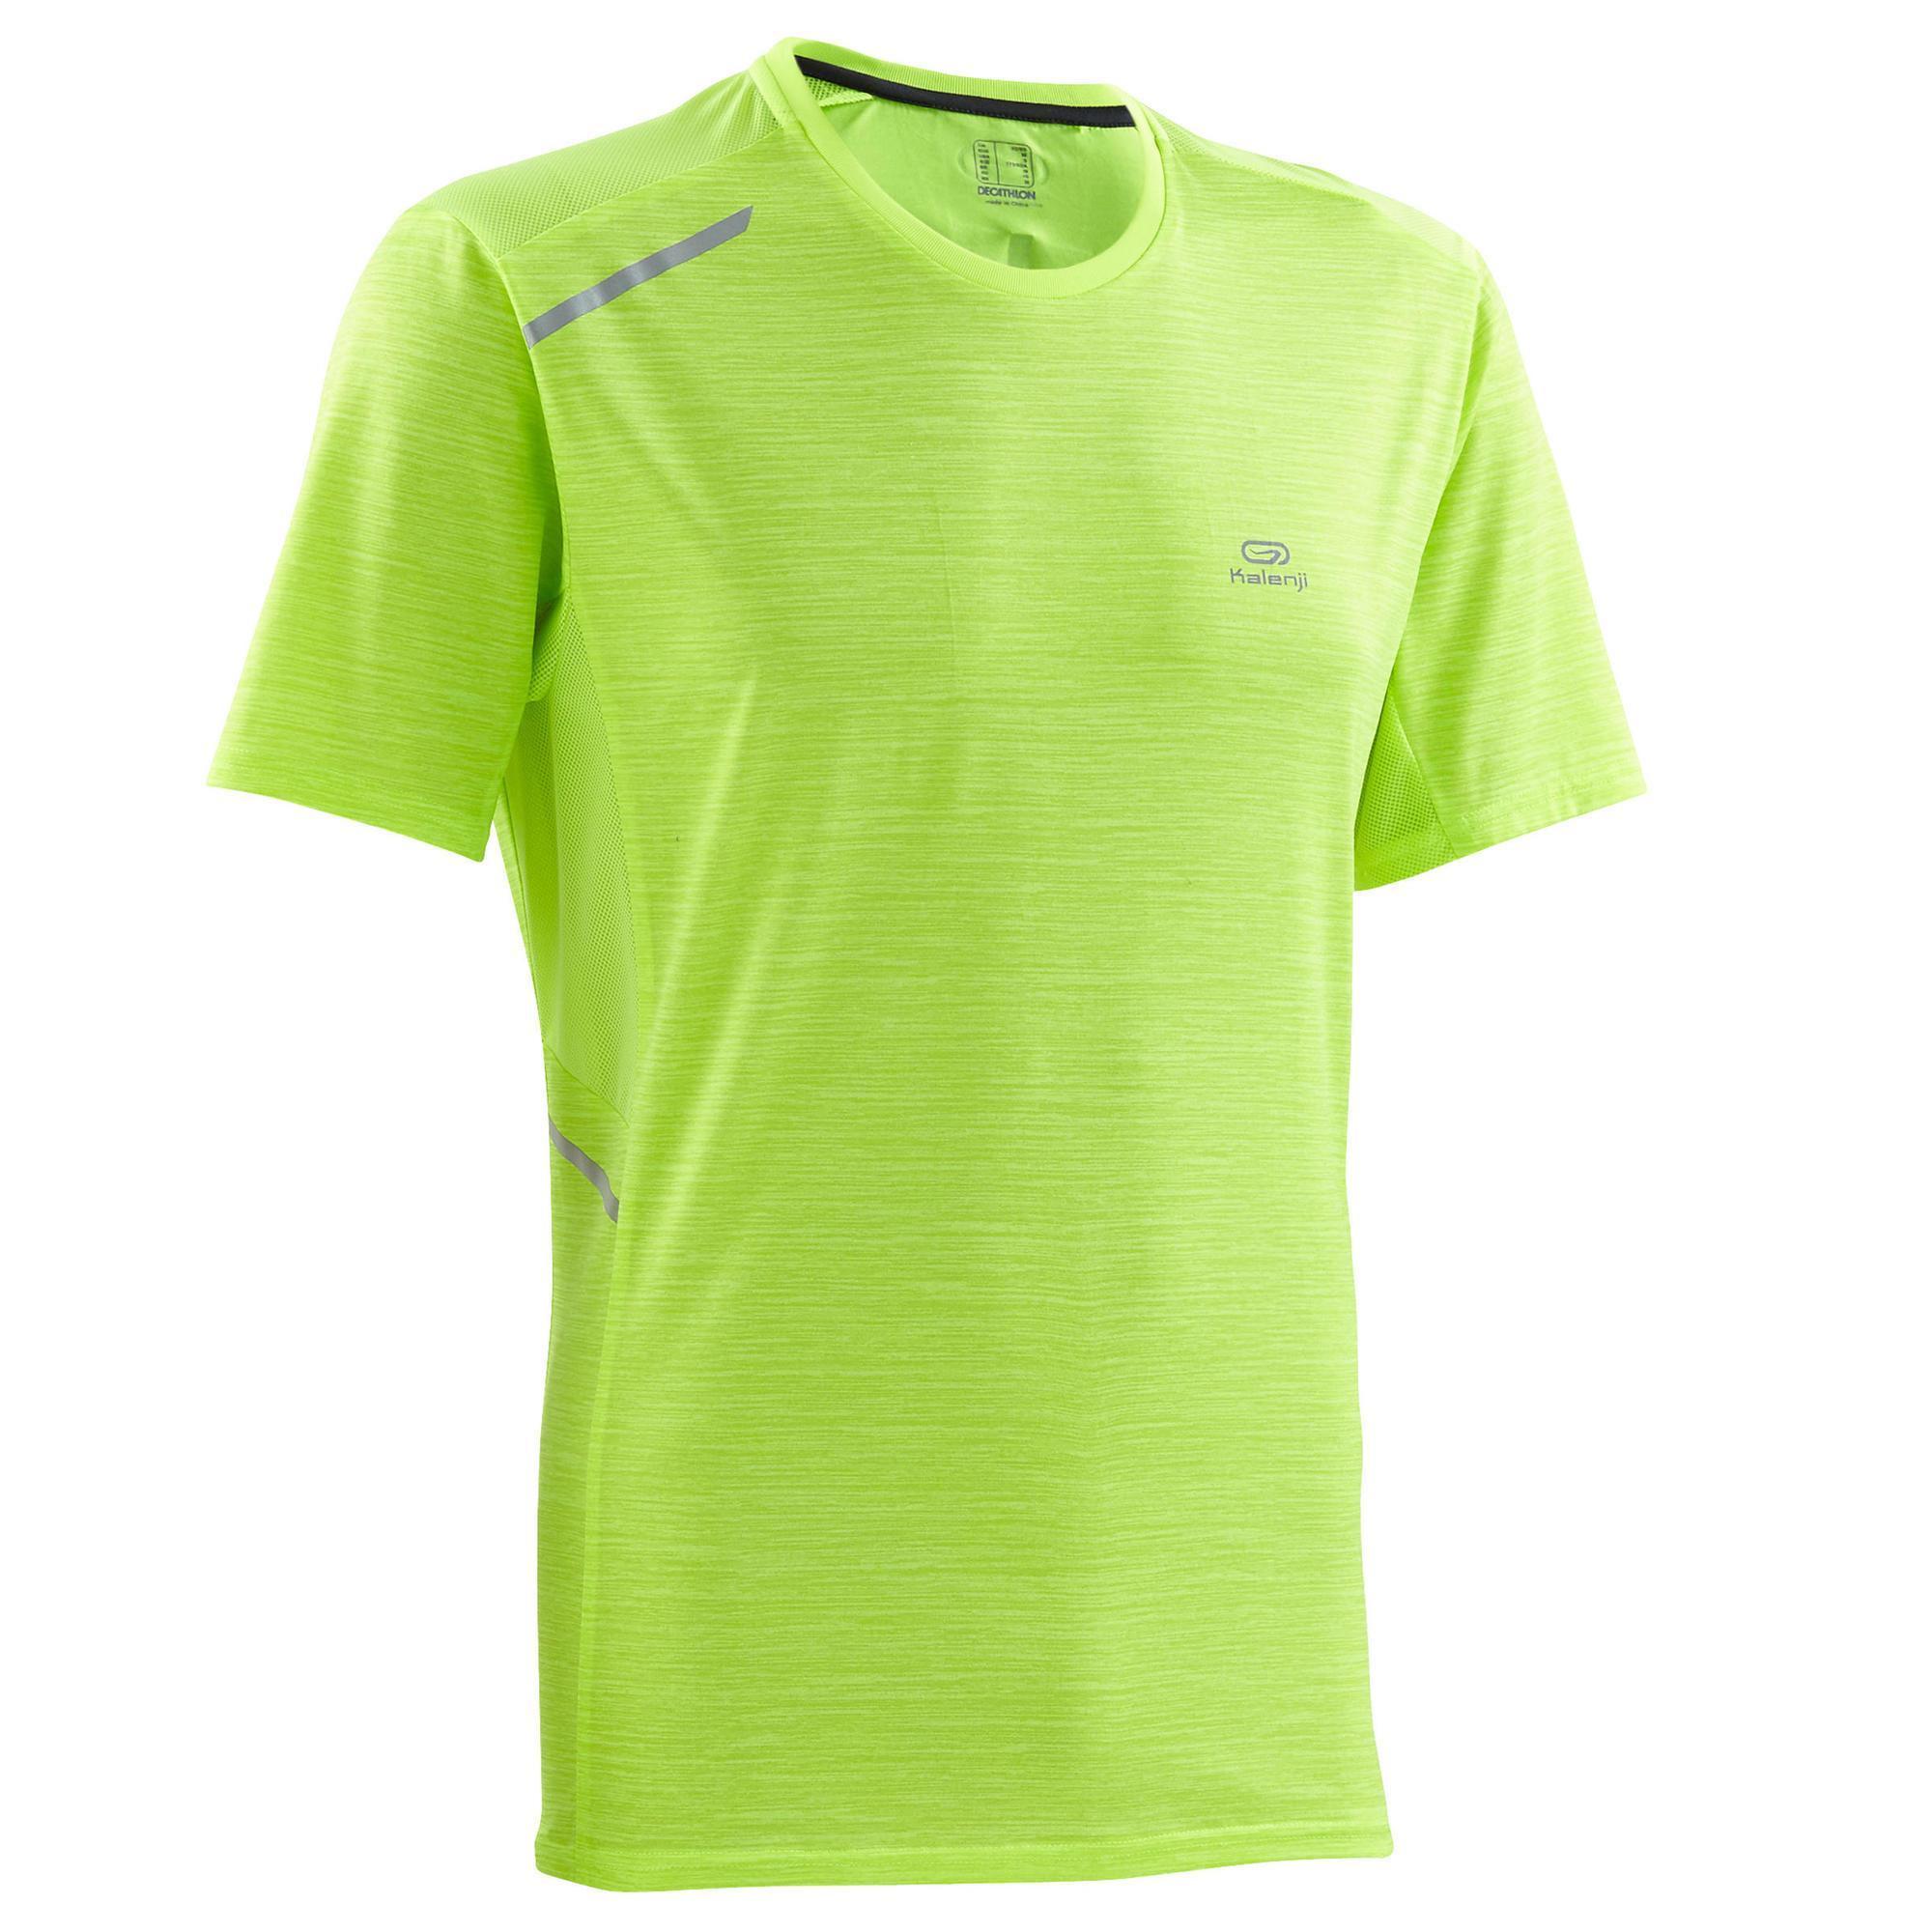 Camiseta de running para hombre Kalenji